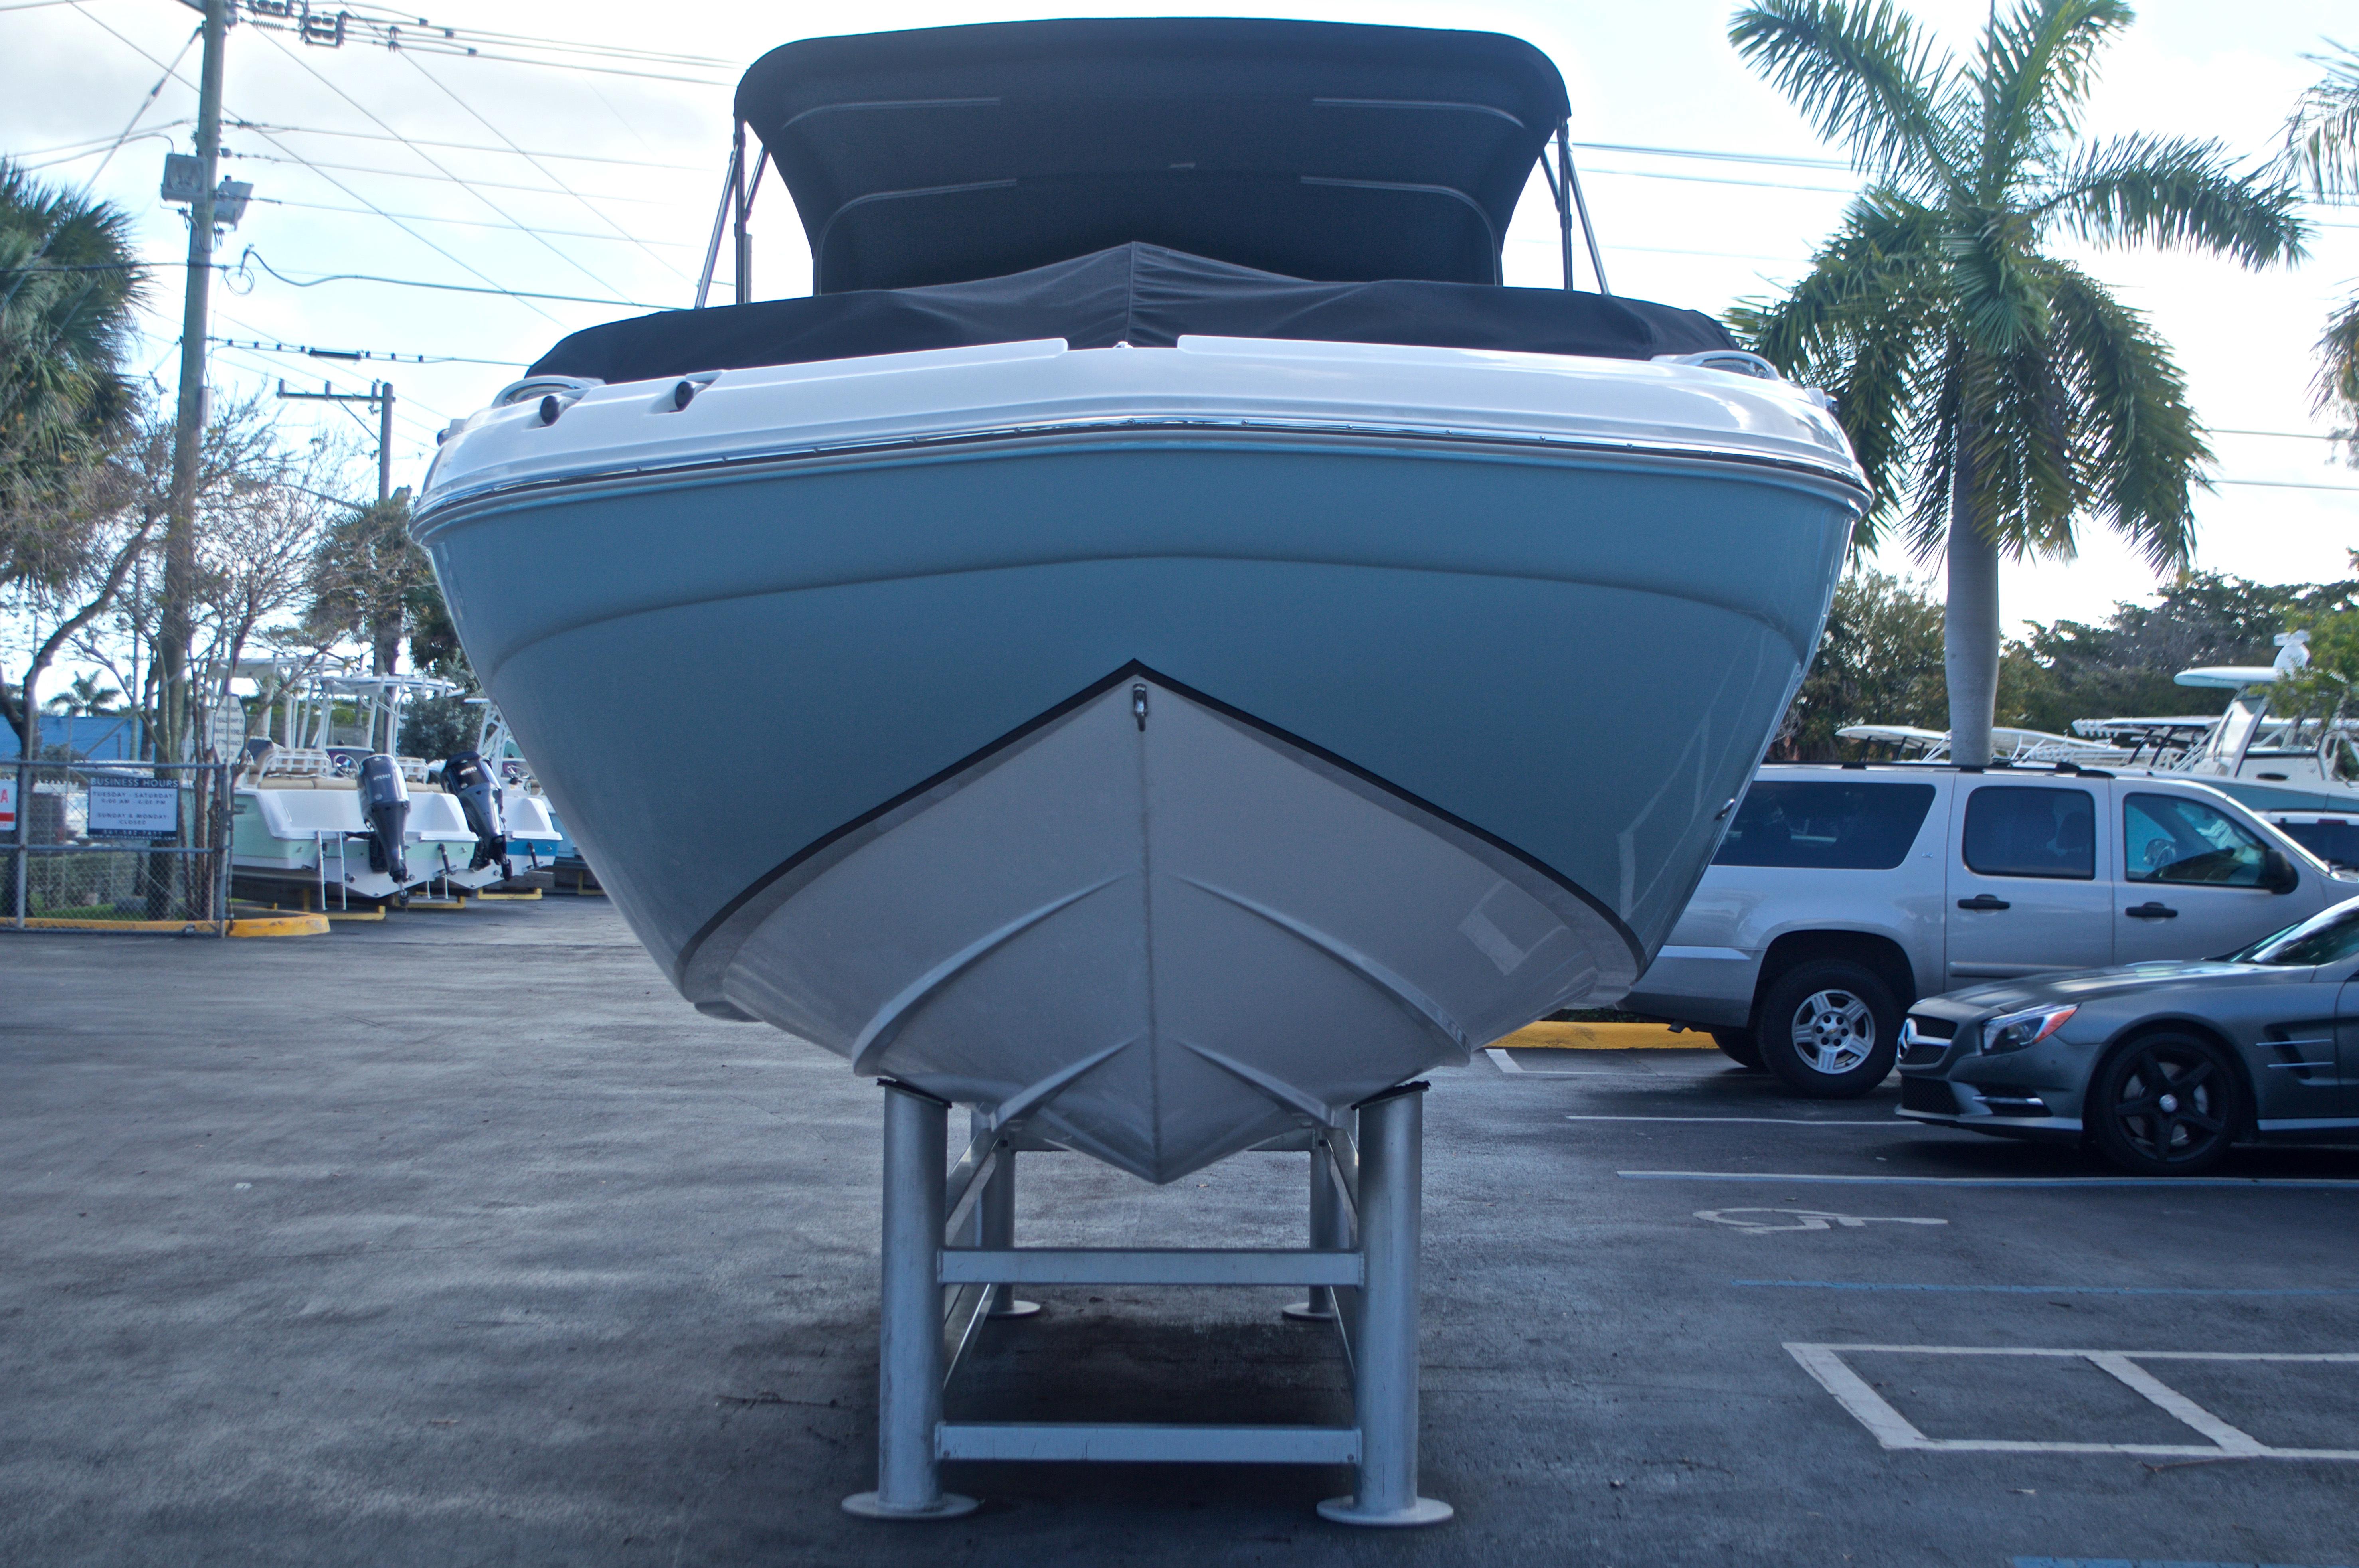 Thumbnail 11 for New 2017 Hurricane SunDeck SD 2400 OB boat for sale in Miami, FL